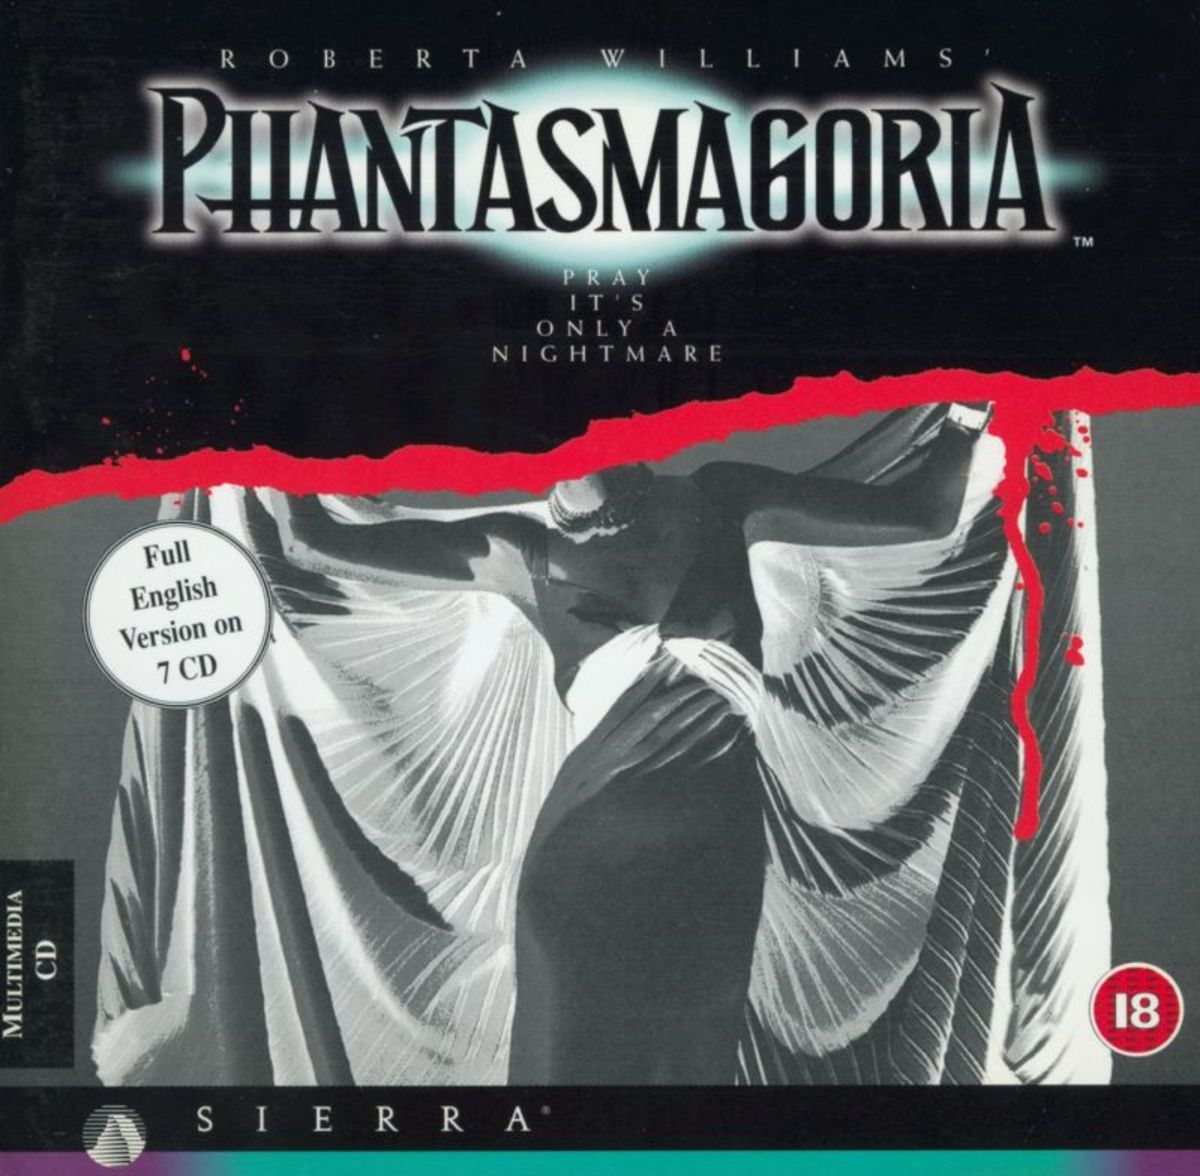 Phantasmagoria jewel case cover